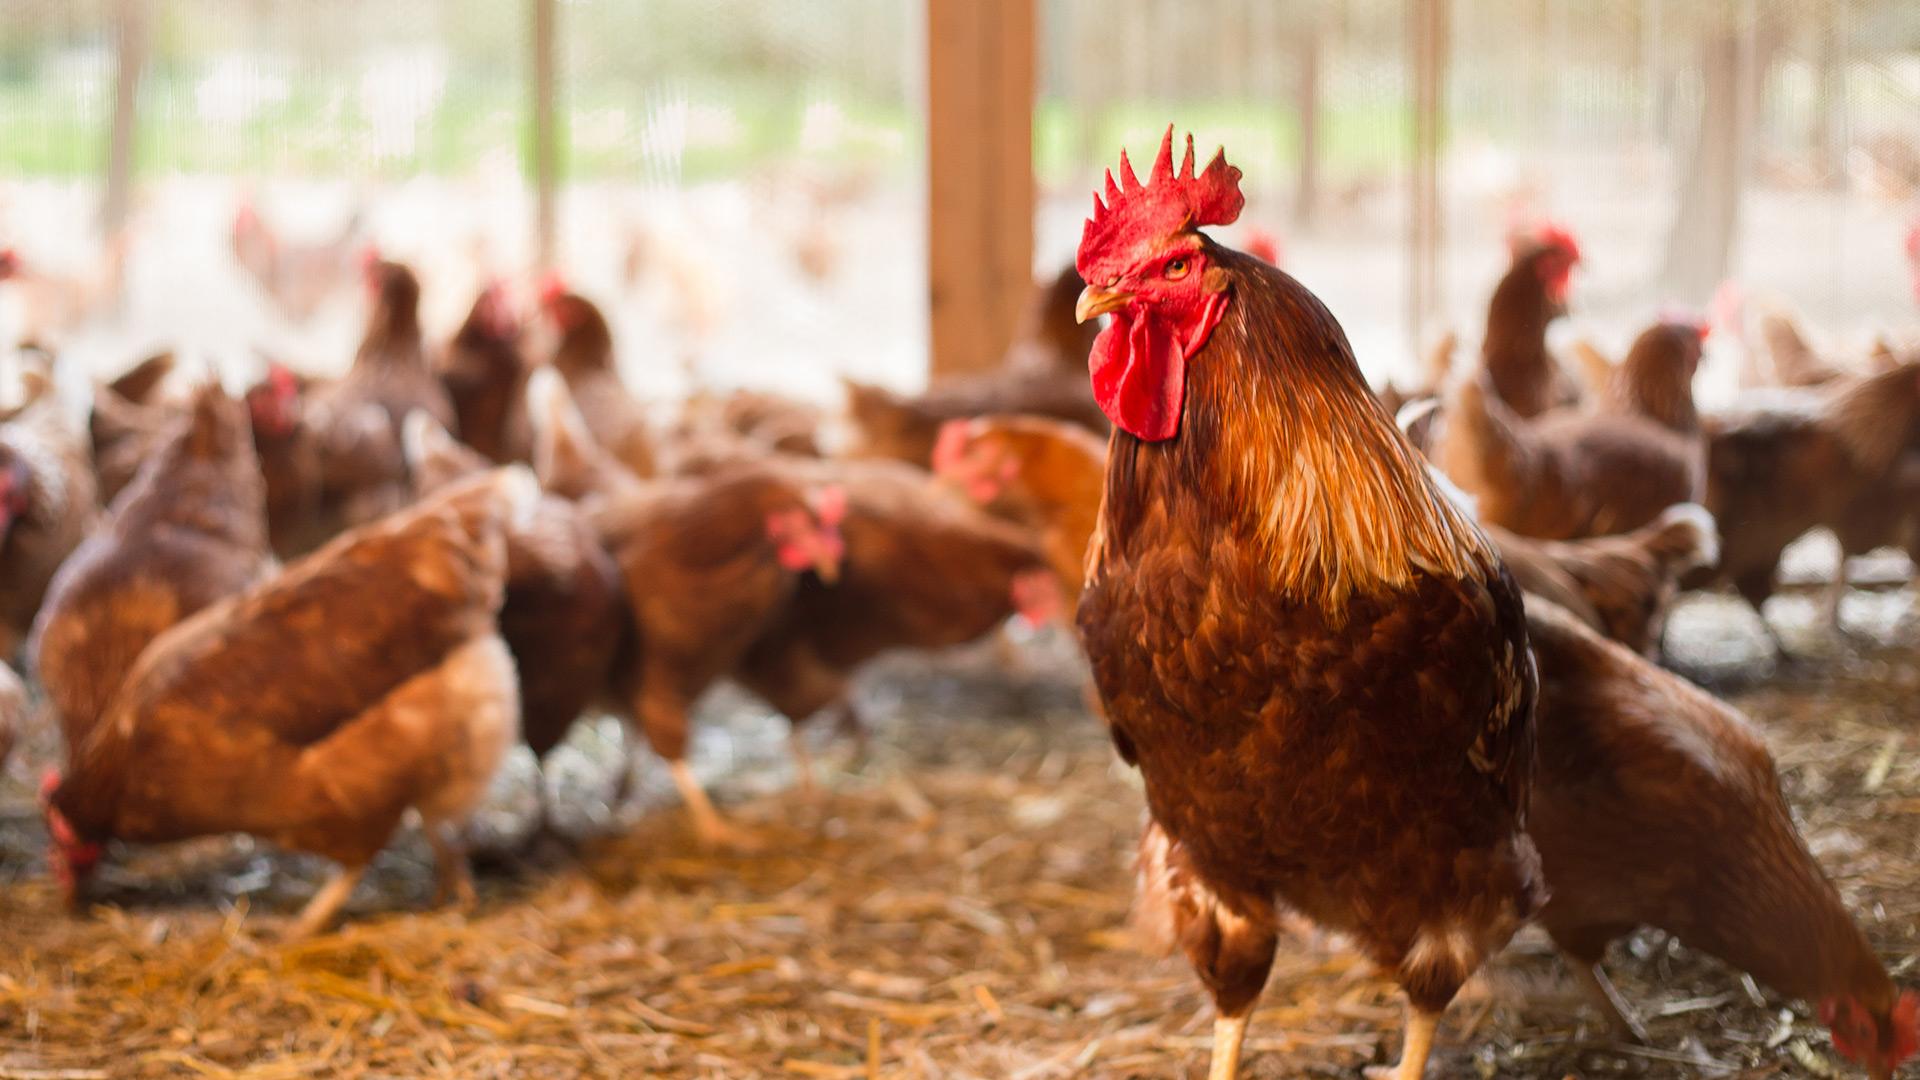 haehnlein Bio-Eier Warenversorgung